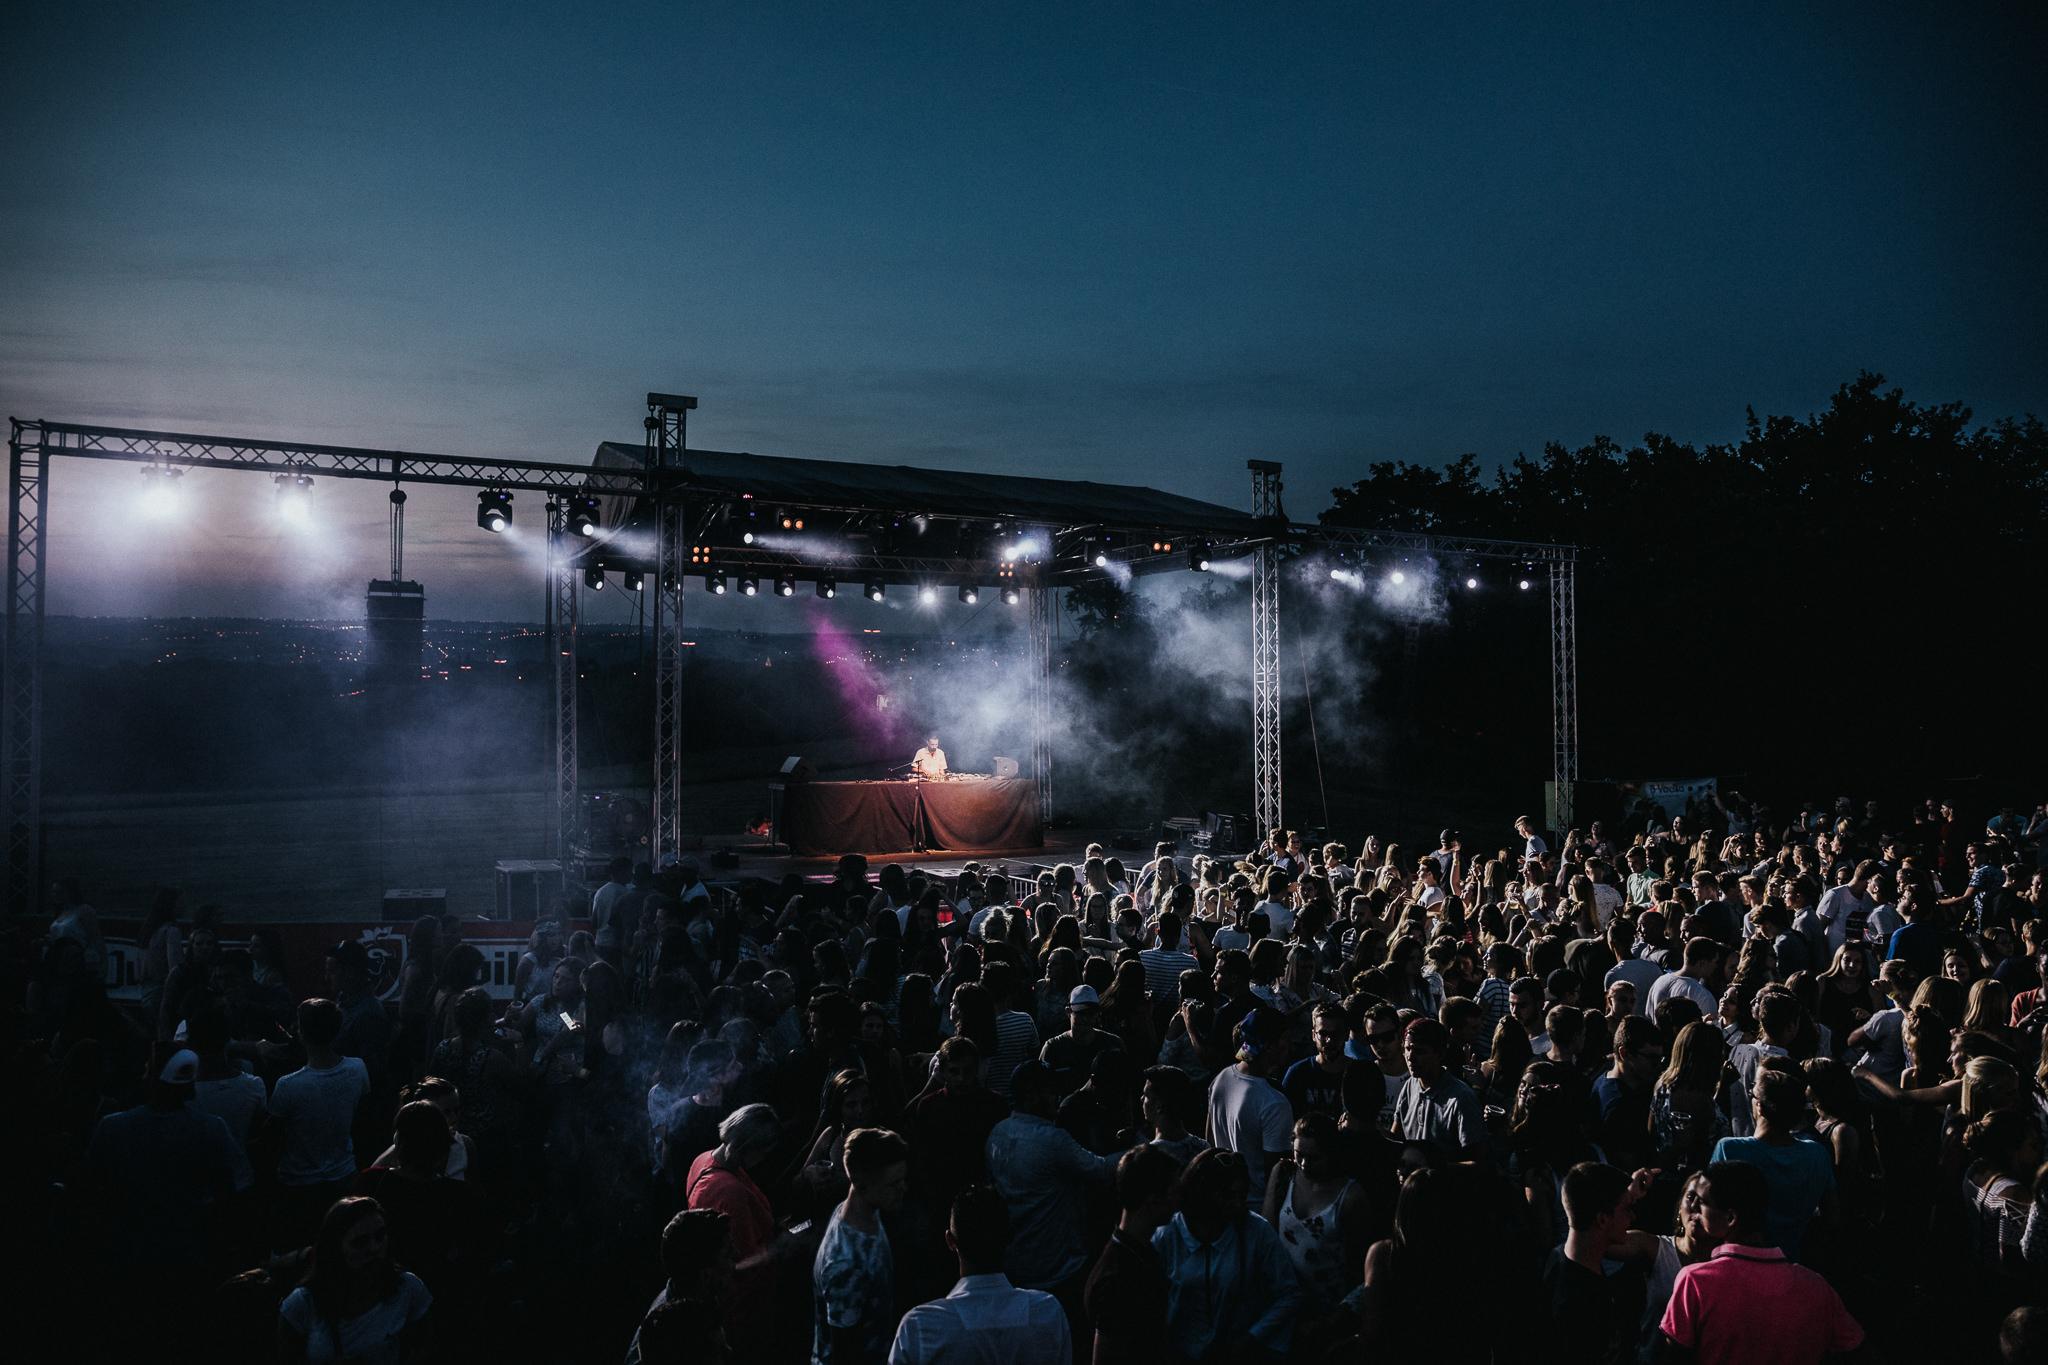 2017-06-21-DJ-FLASH-TOM-BARBIER-9359-LD.jpg